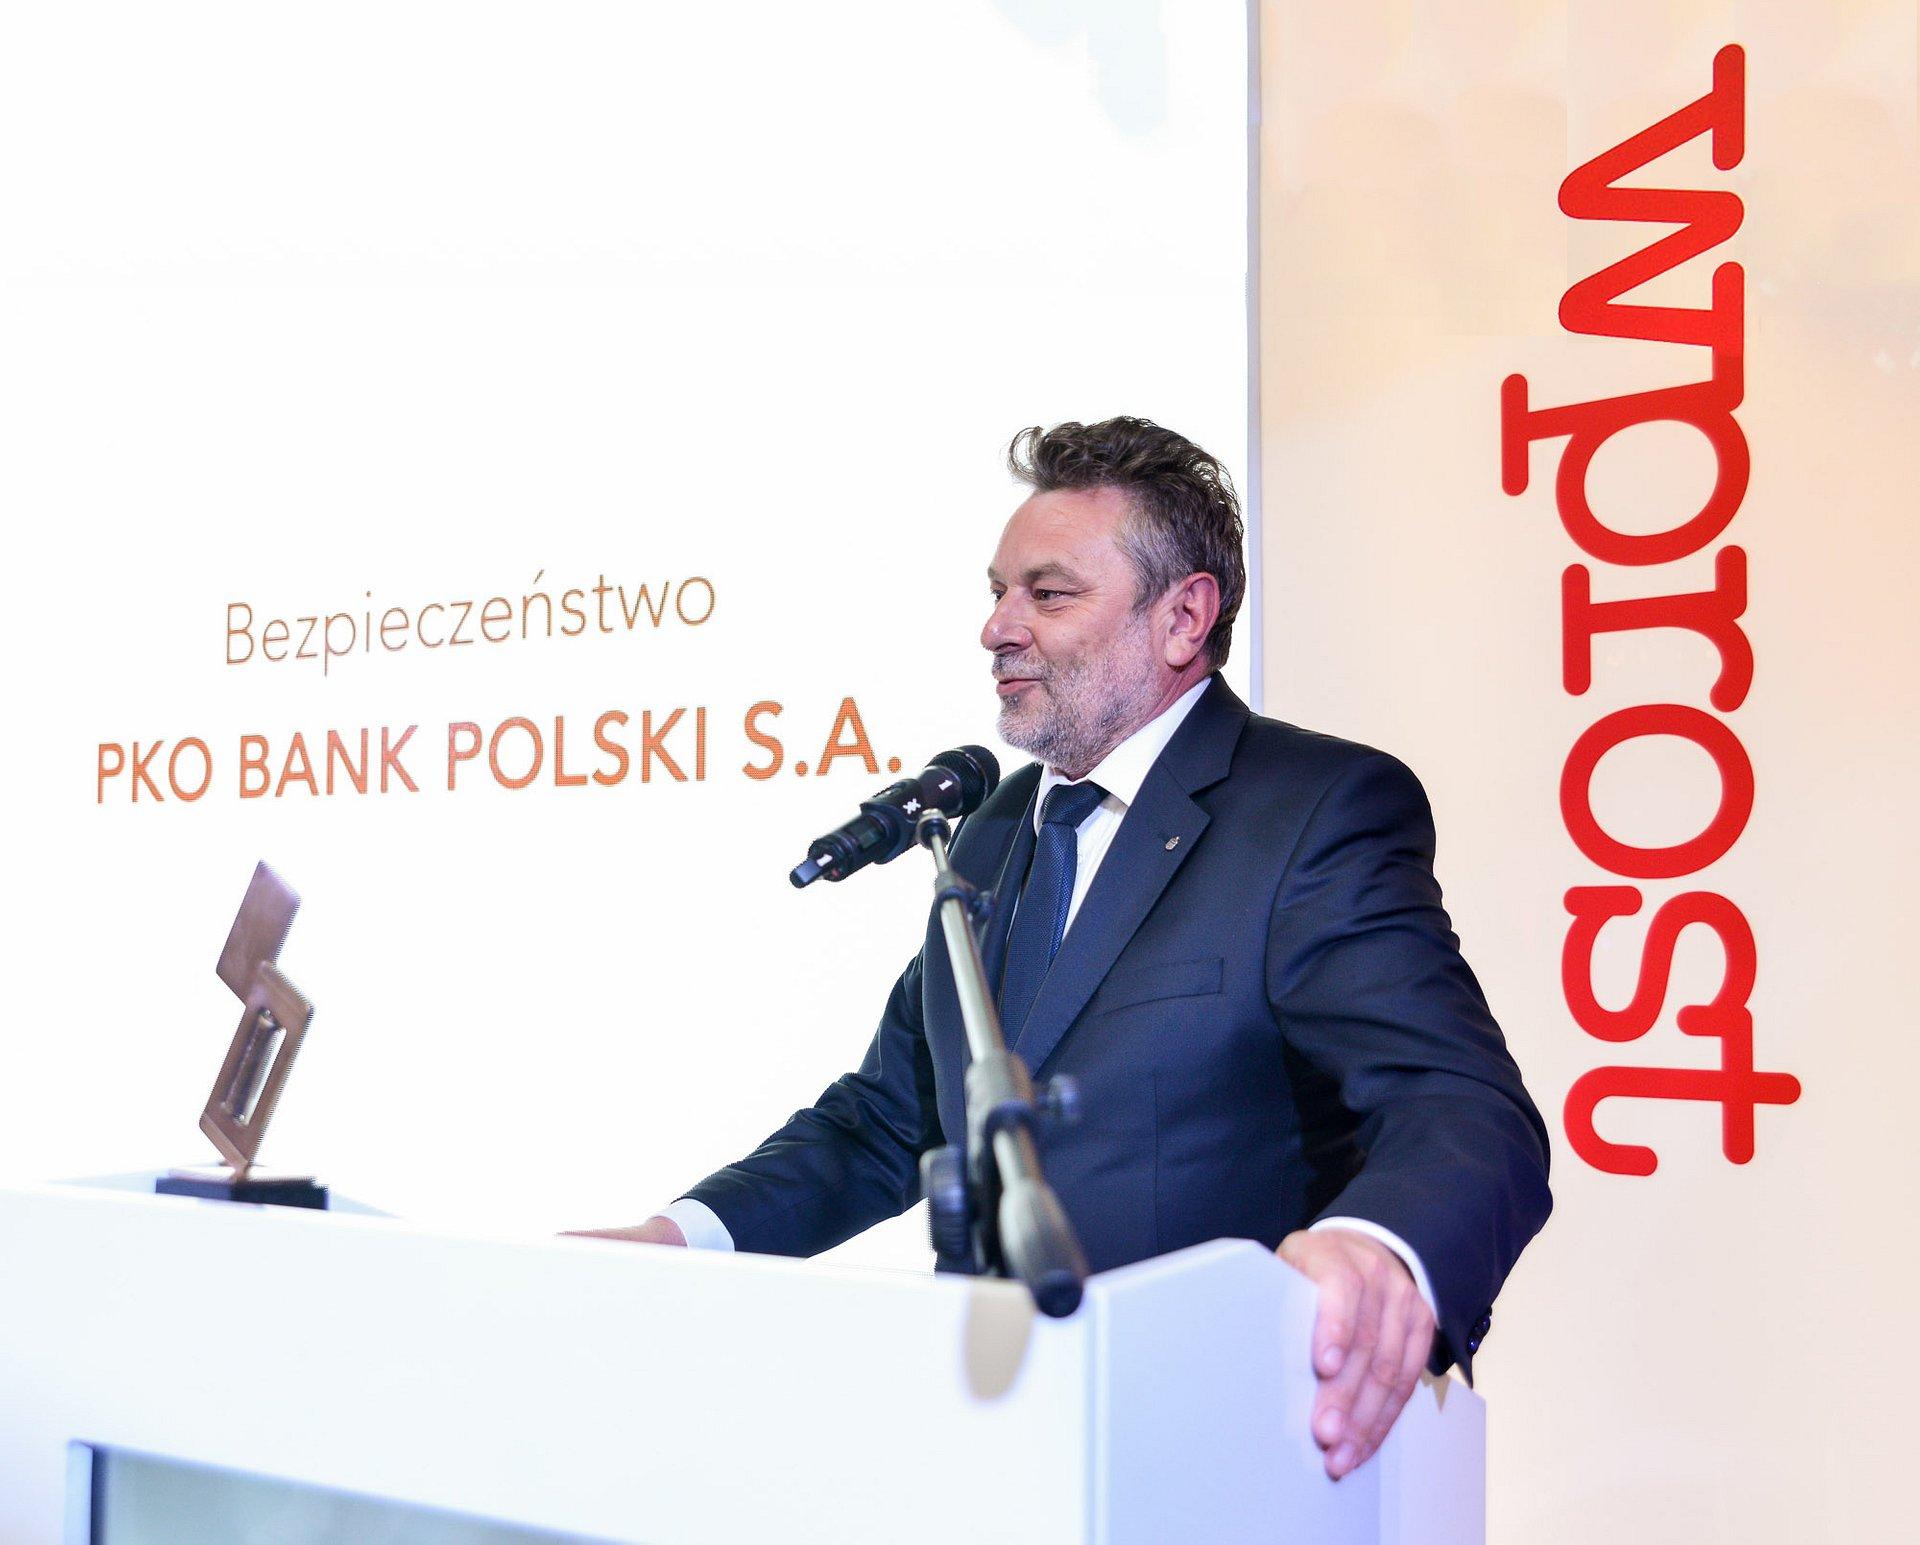 "PKO Bank Polski laureatem konkursu ""Portfel Roku Tygodnika Wprost 2017"""